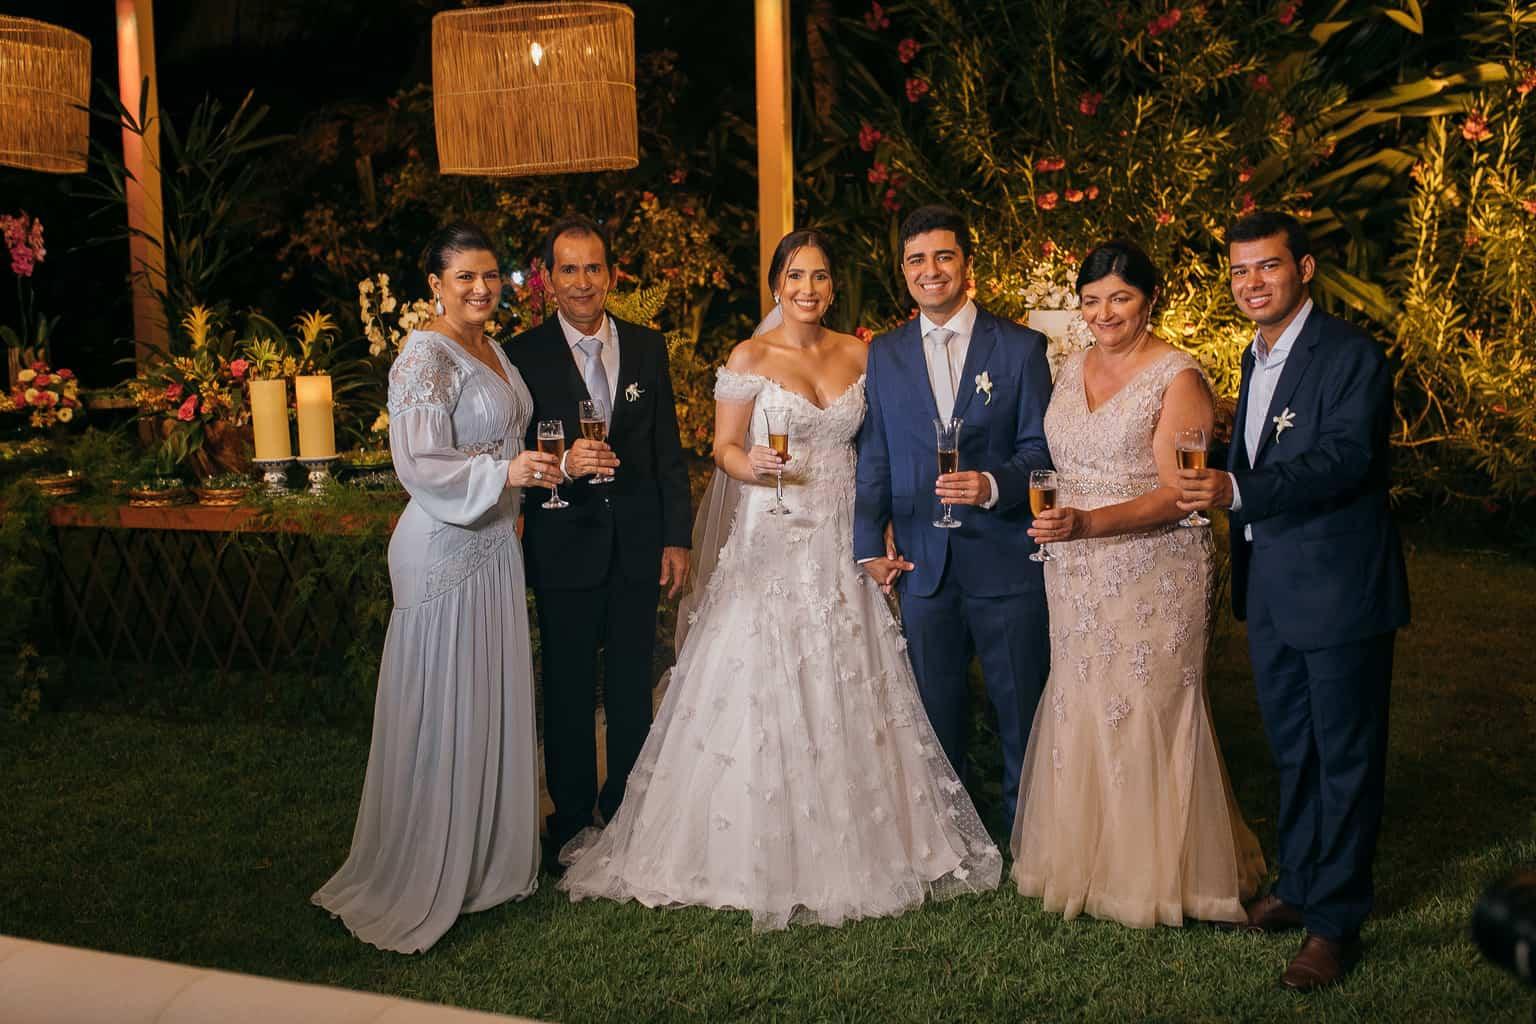 Casamento-Gardenia-e-Marcos-Antonio-Paulo-Bezerra-Joao-Curvelo-Carol-Maiorano1353